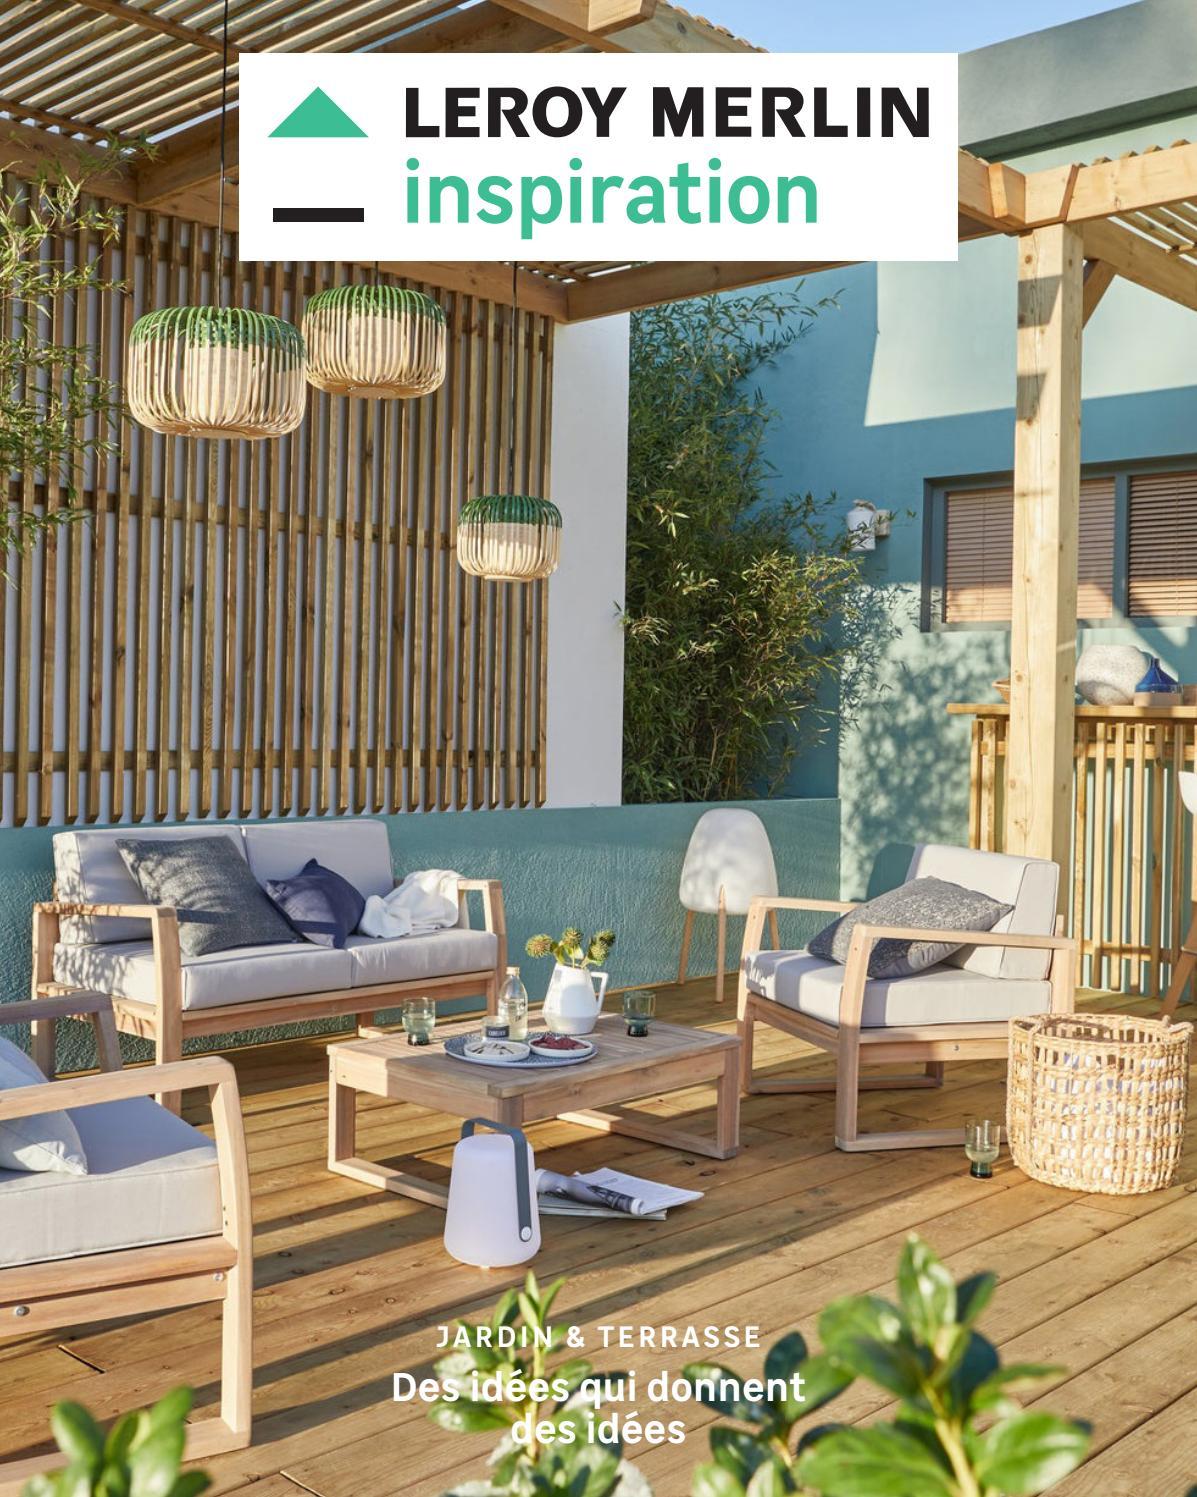 Leroy Merlin Guide Jardin 2020 By Agencecourtcircuit Issuu